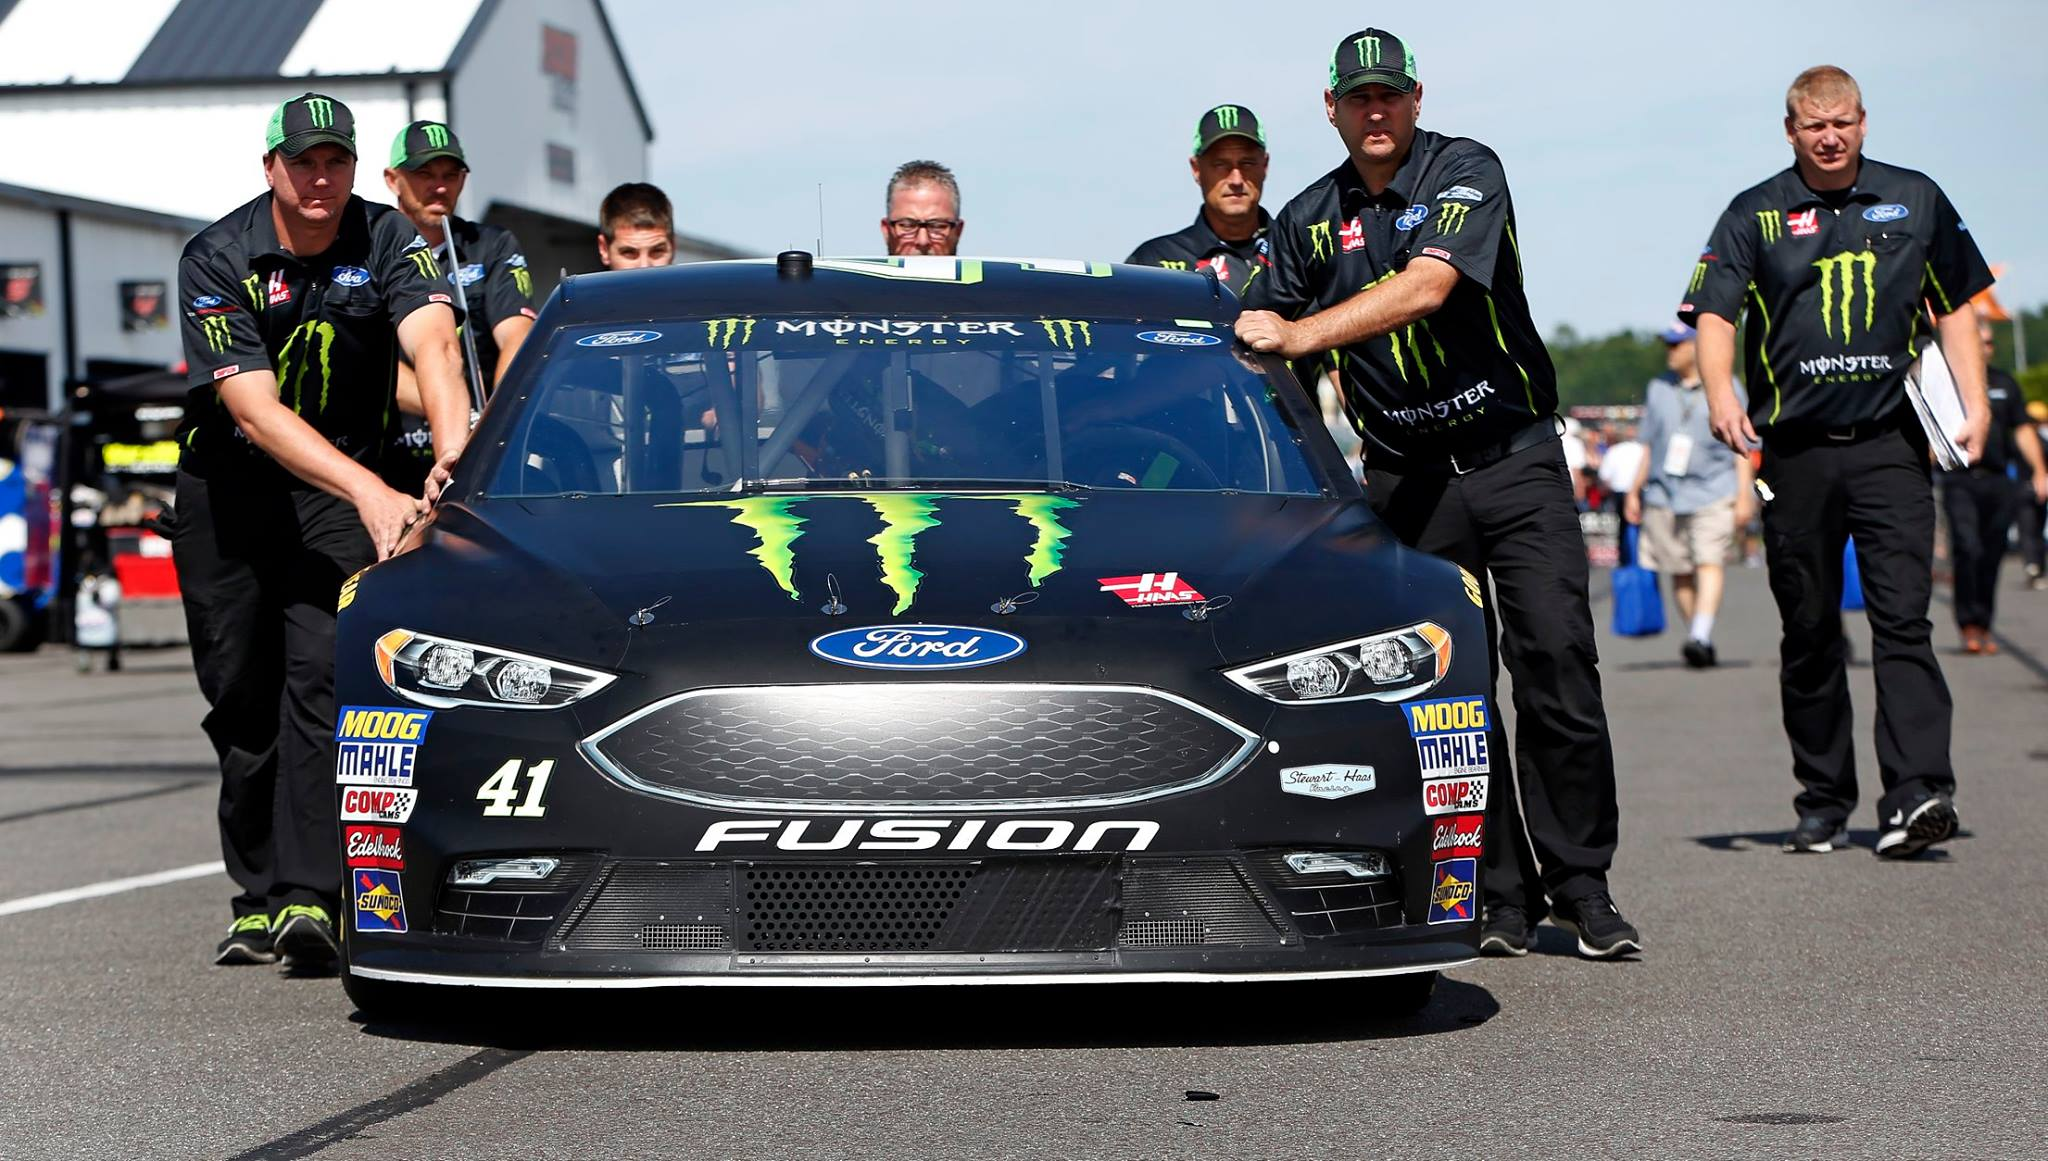 Tony Gibson on NASCAR information sharing between teams